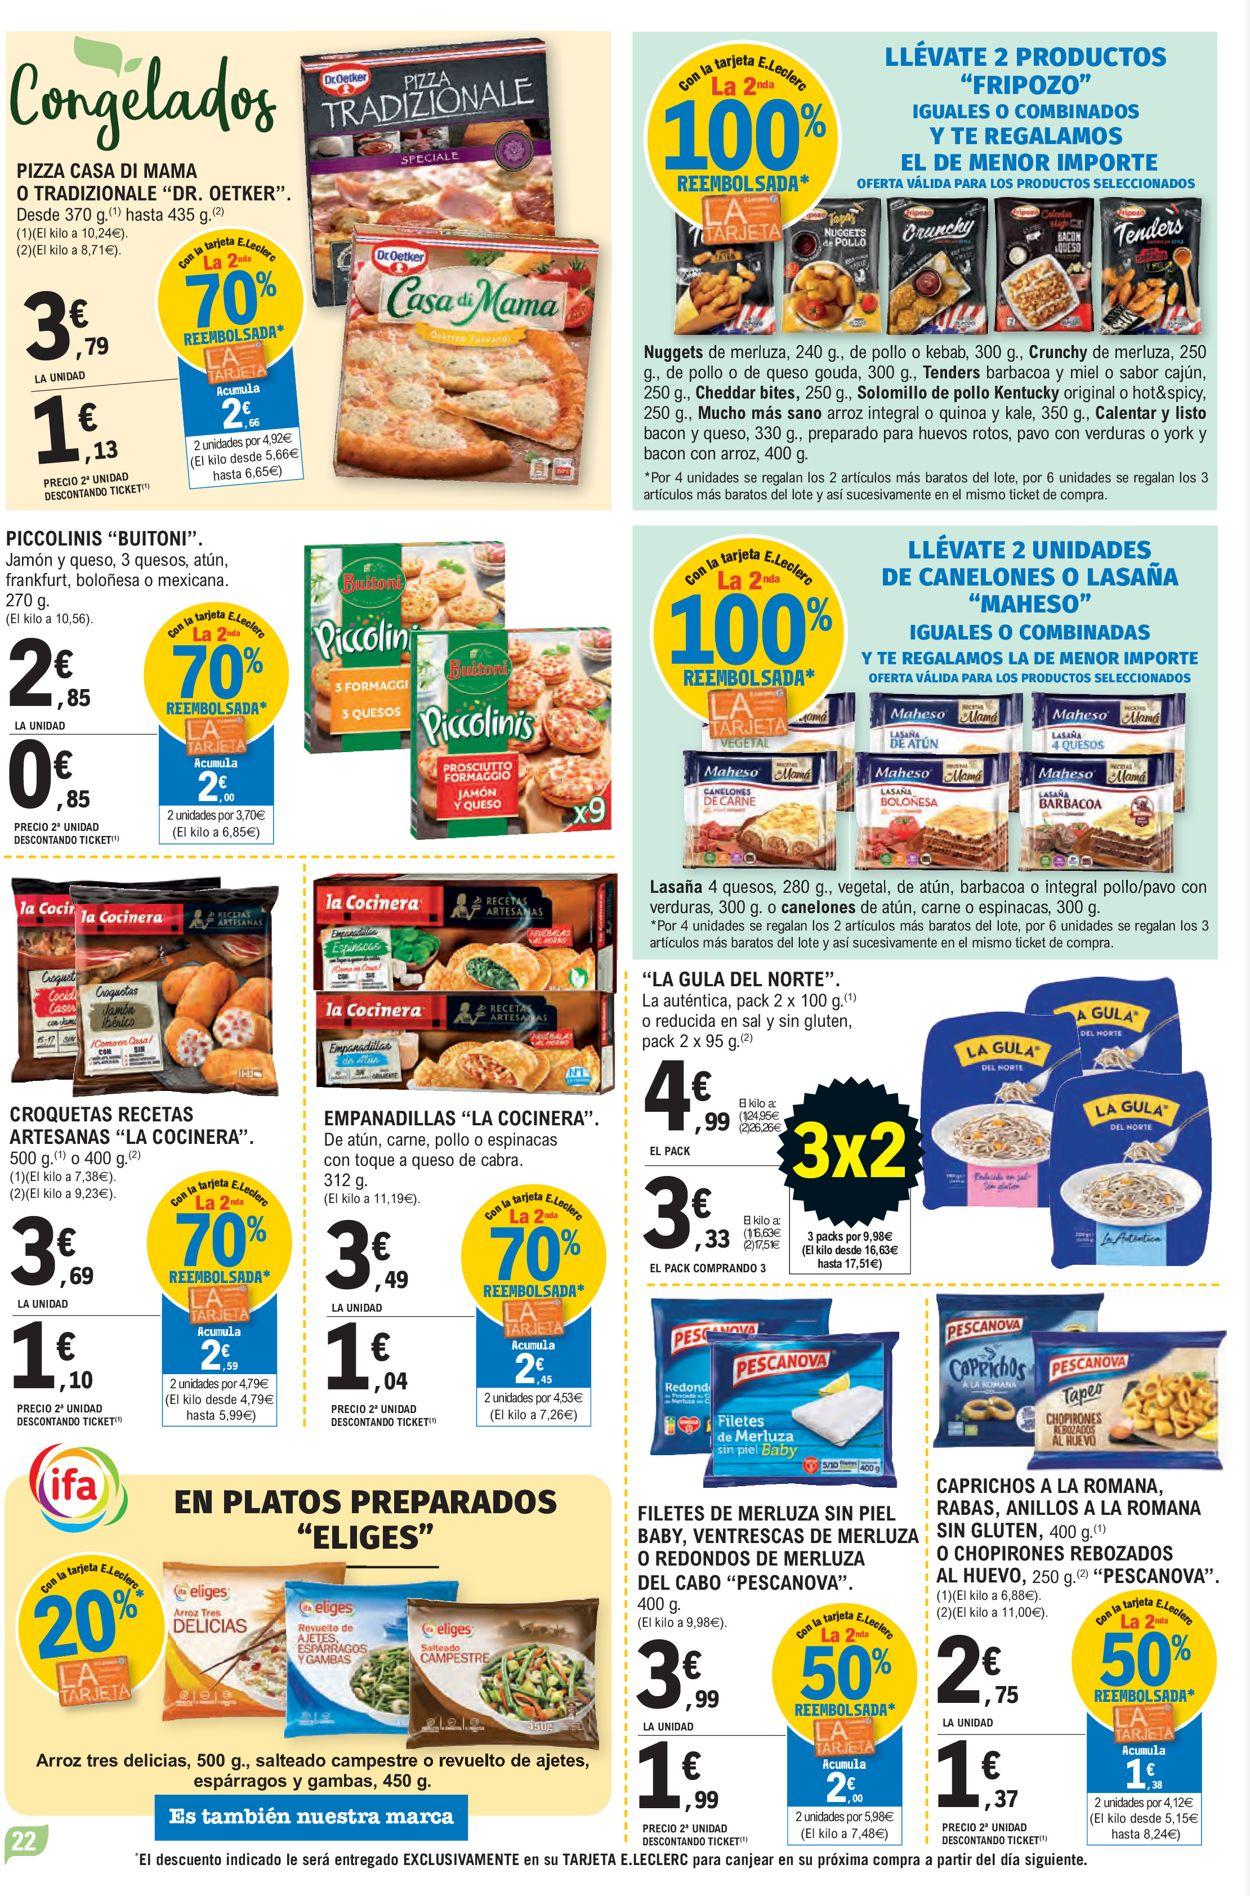 E.leclerc Folleto - 23.06-04.07.2021 (Página 22)